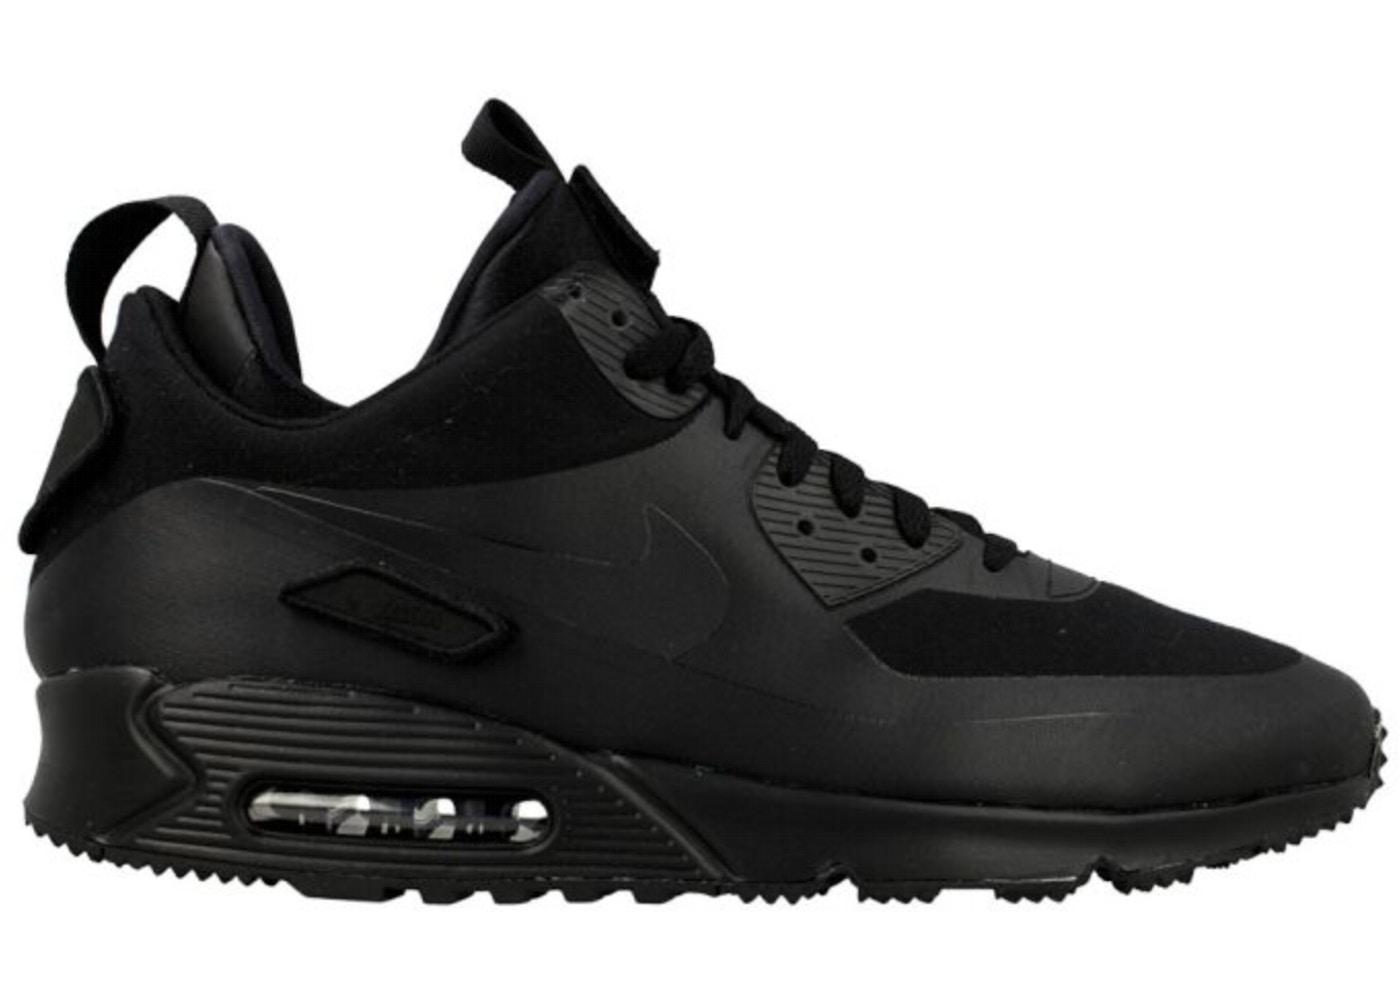 a38df68574b49 ... Air Max 90 Sneakerboot Patch Black Nike ...